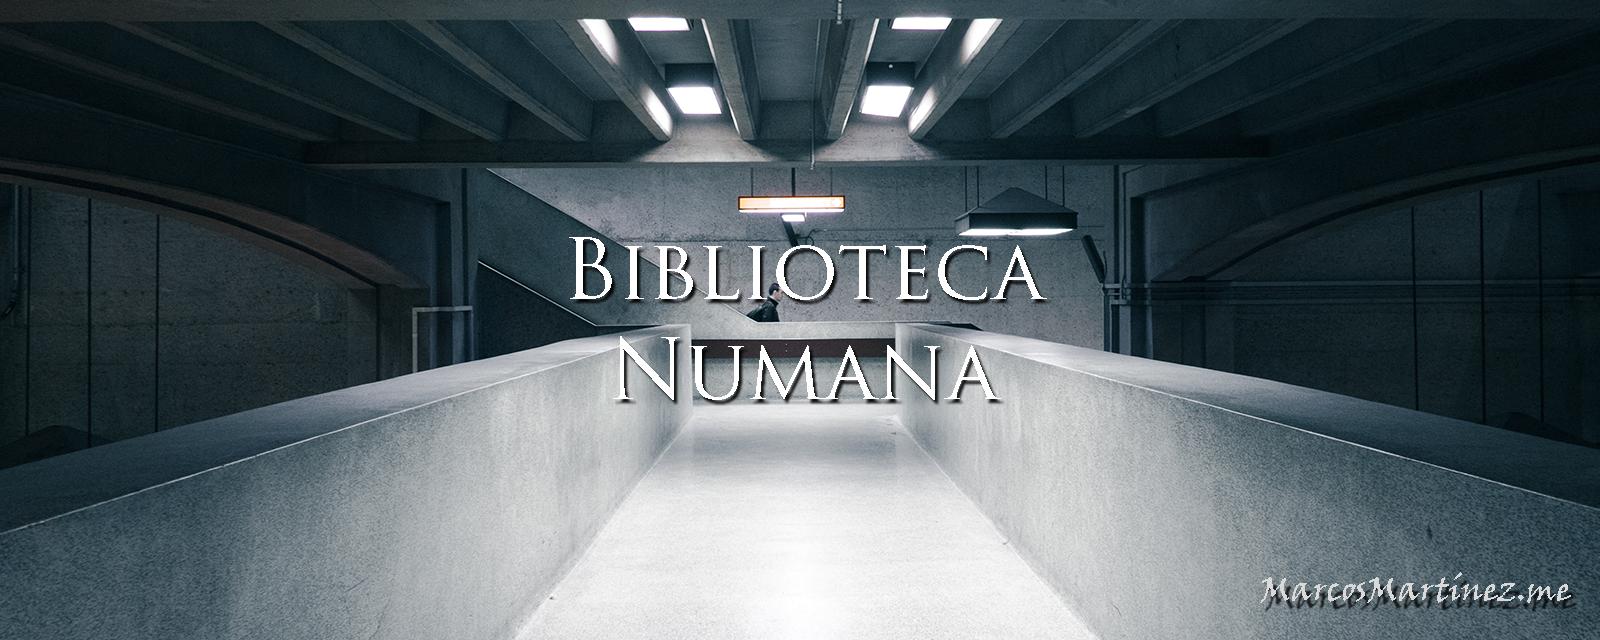 Biblioteca Numana, granja de genios